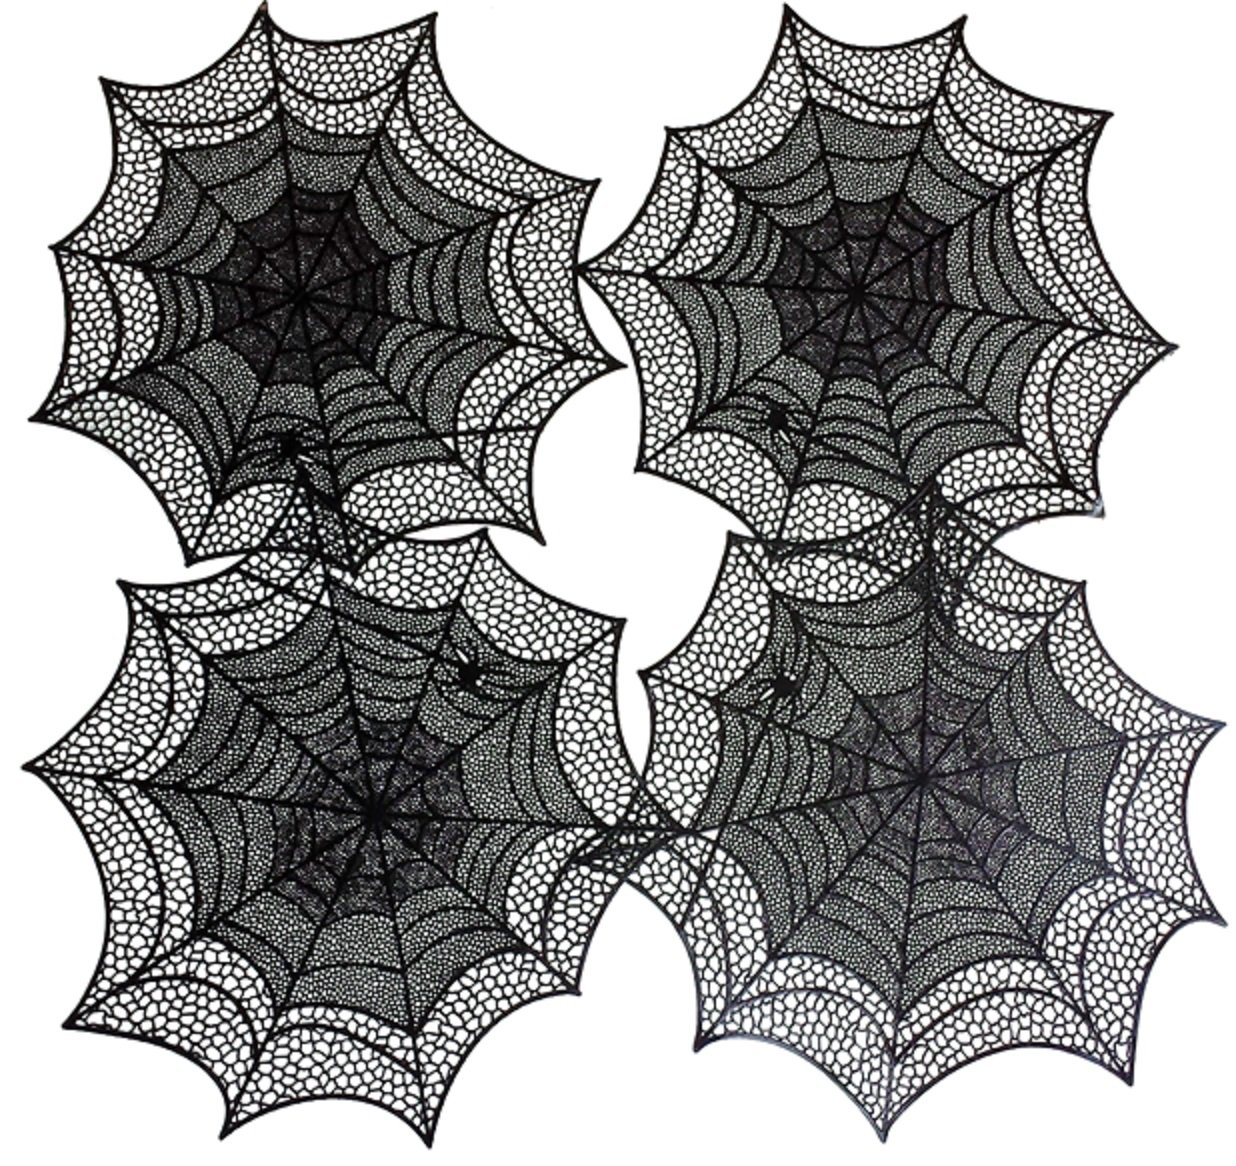 Benson Mills Spider Web Pressedビニールプレースマット、ブラック、4のセット   B016MUG68Q